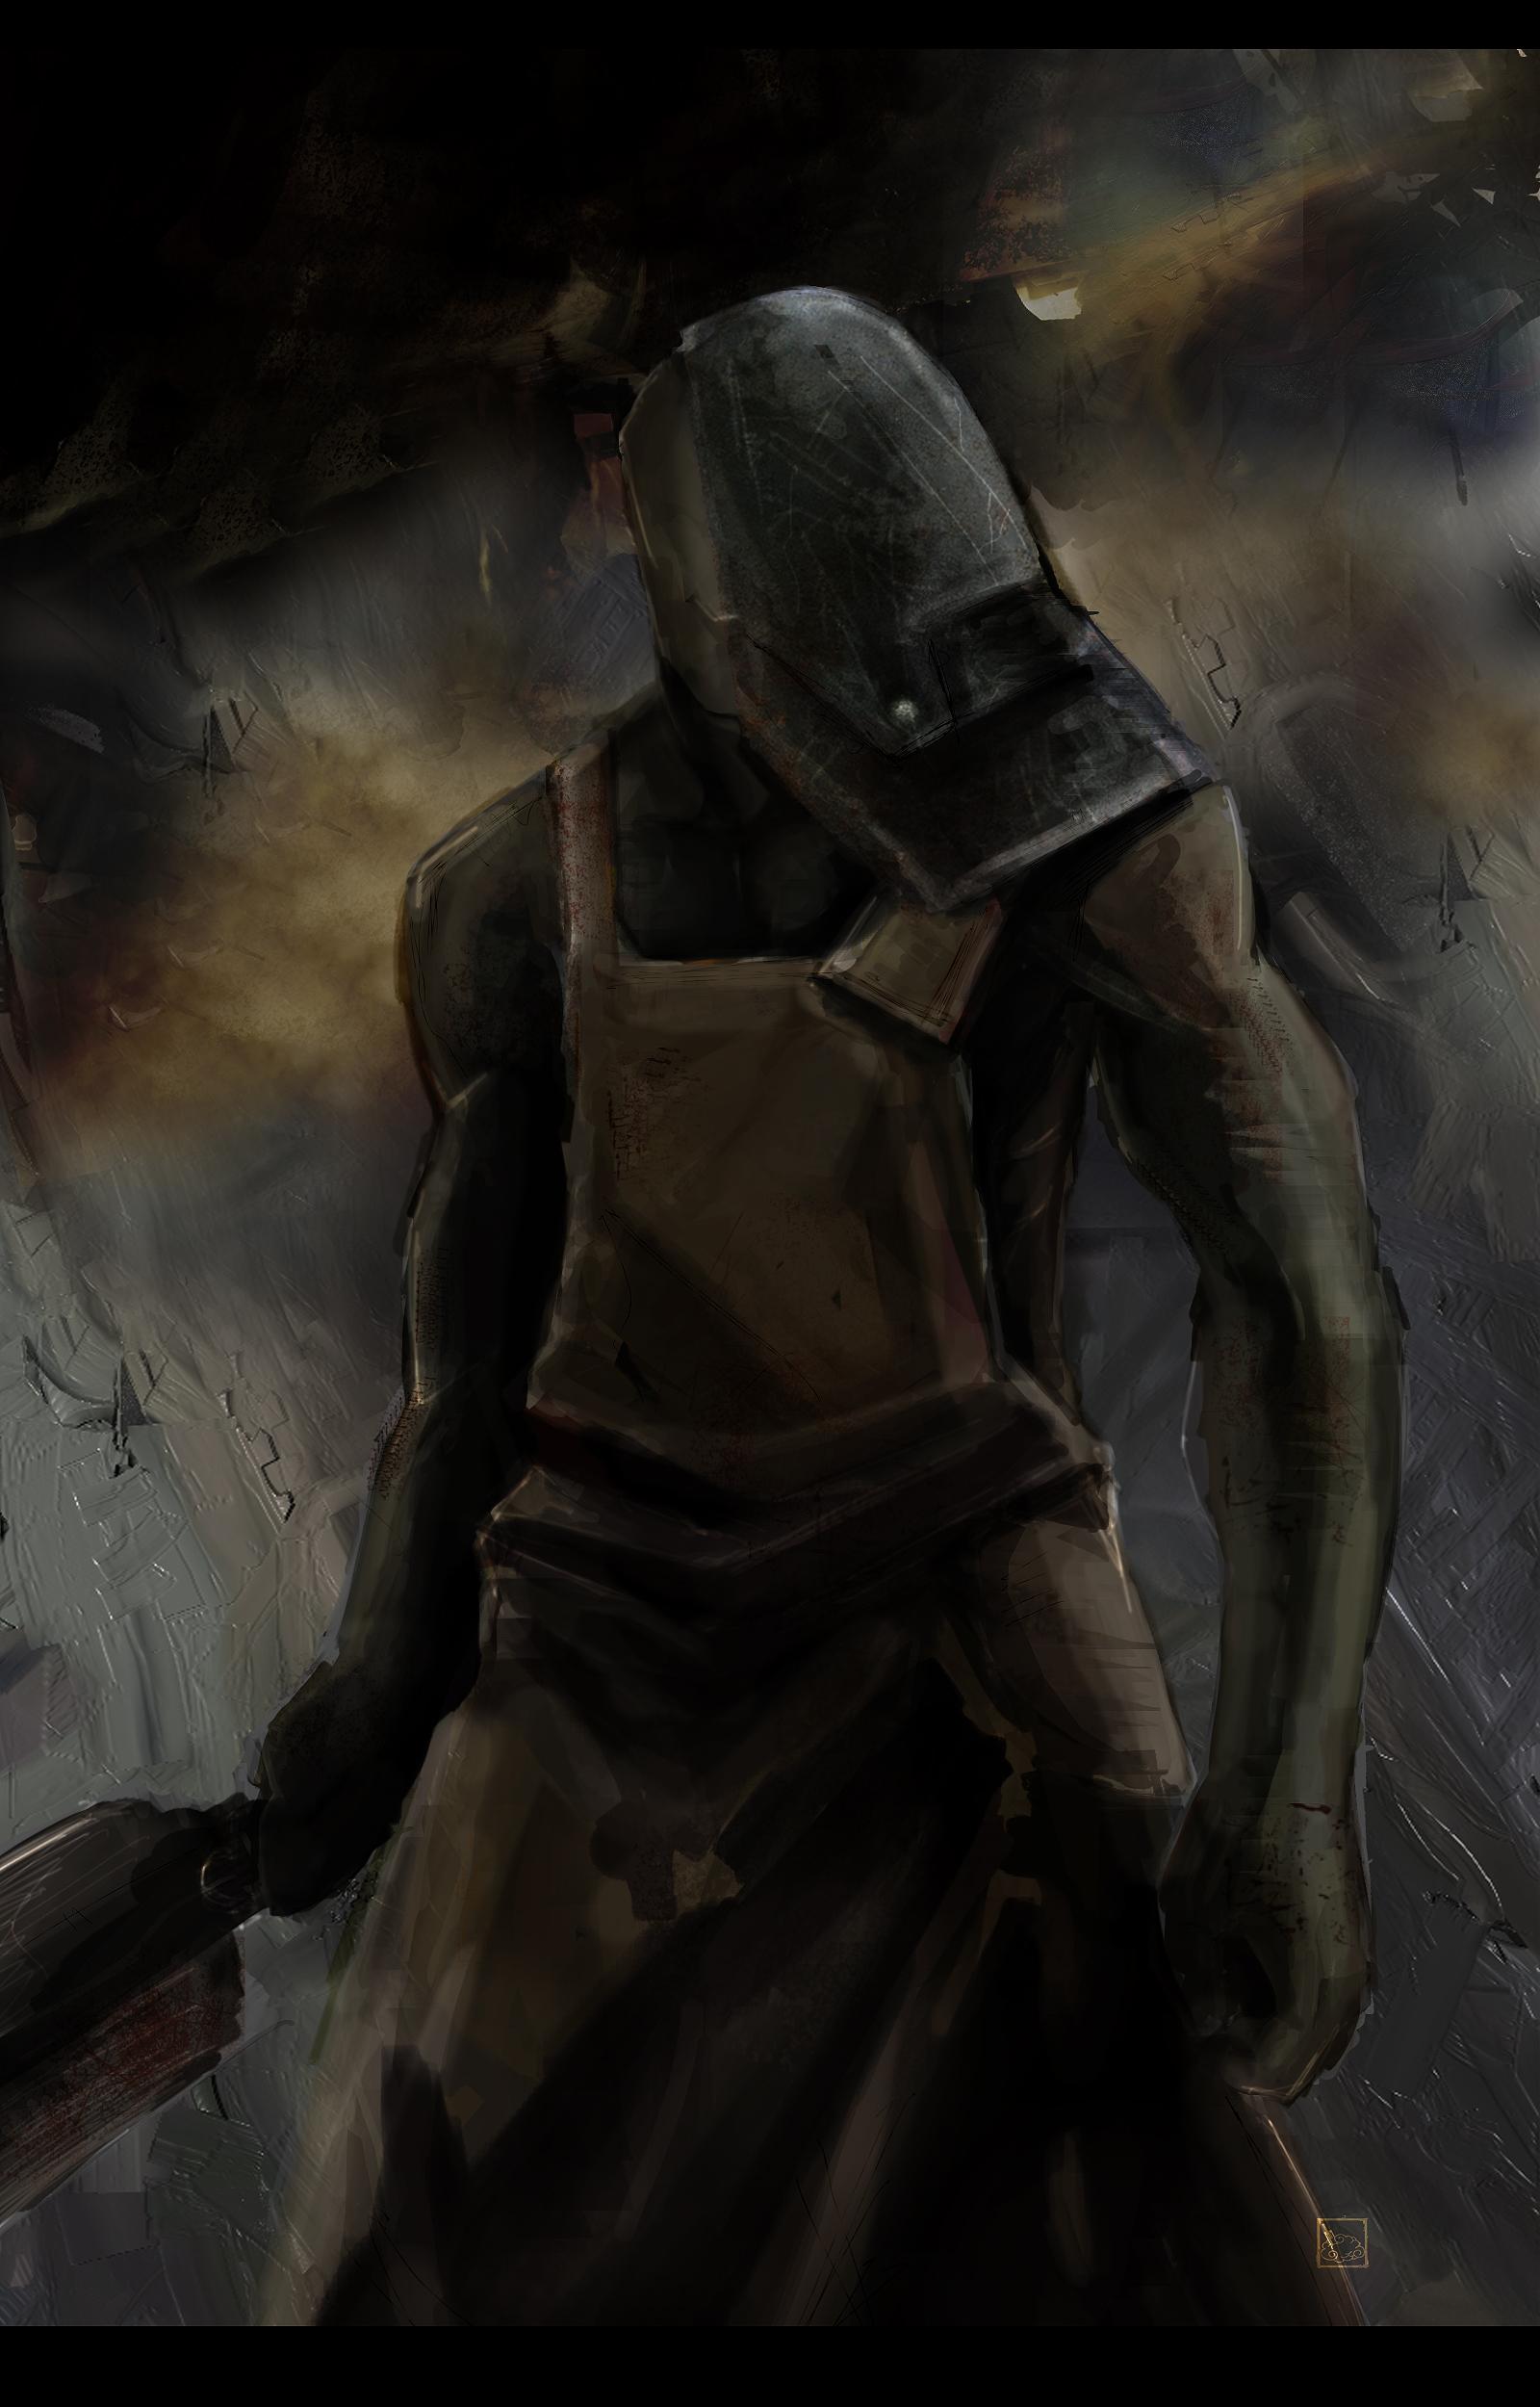 [Ideas] Enemigos de Silent Hill The_Butcher_by_bustercloud